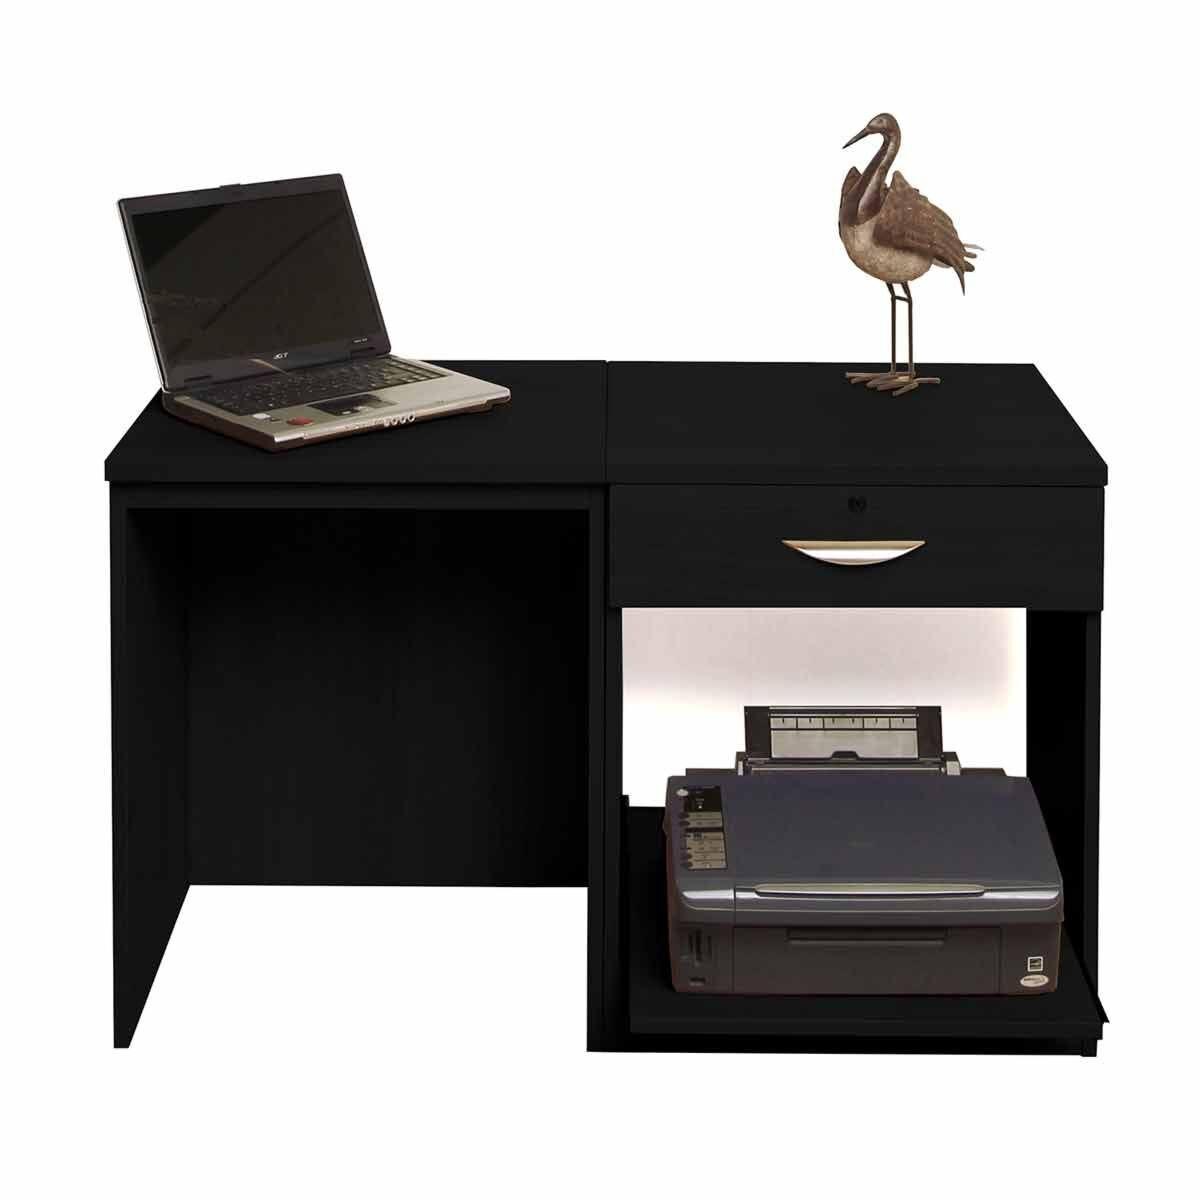 R White Home Office Desk Set with Drawer Black Havana